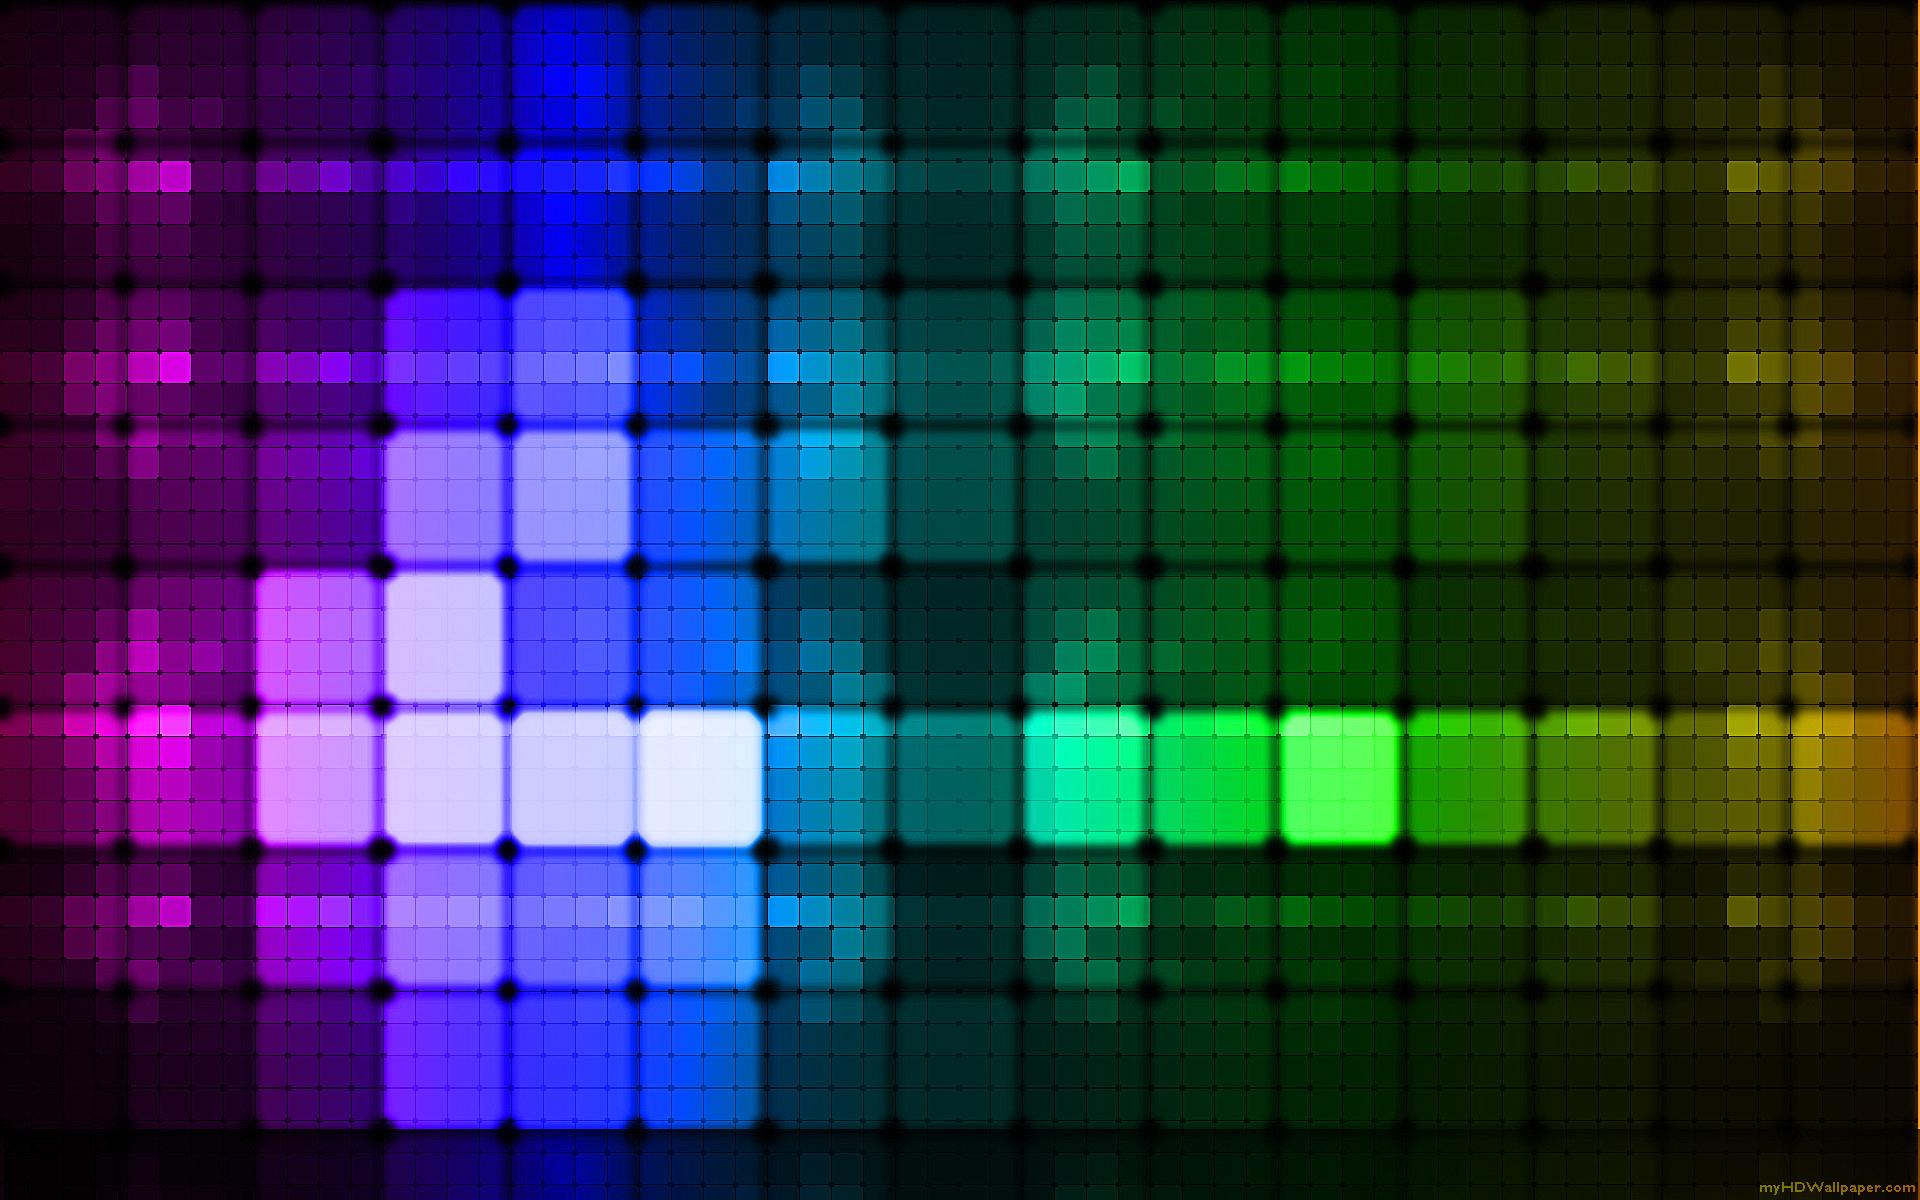 Rainbow Tiles by Landon783